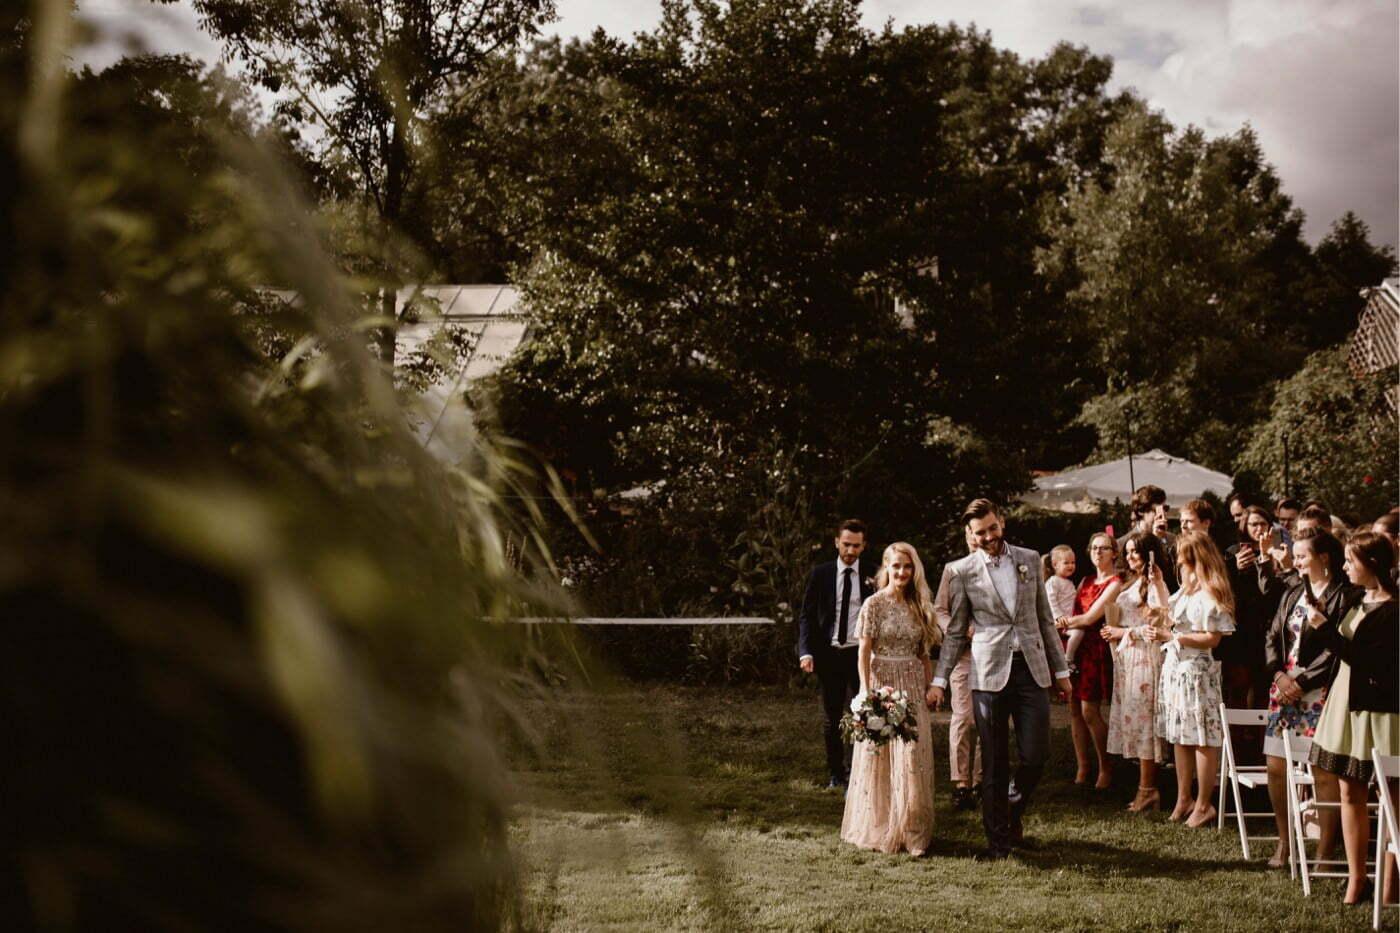 ewelina zieba rustykalne wesele stara oranzeria warszawa 040